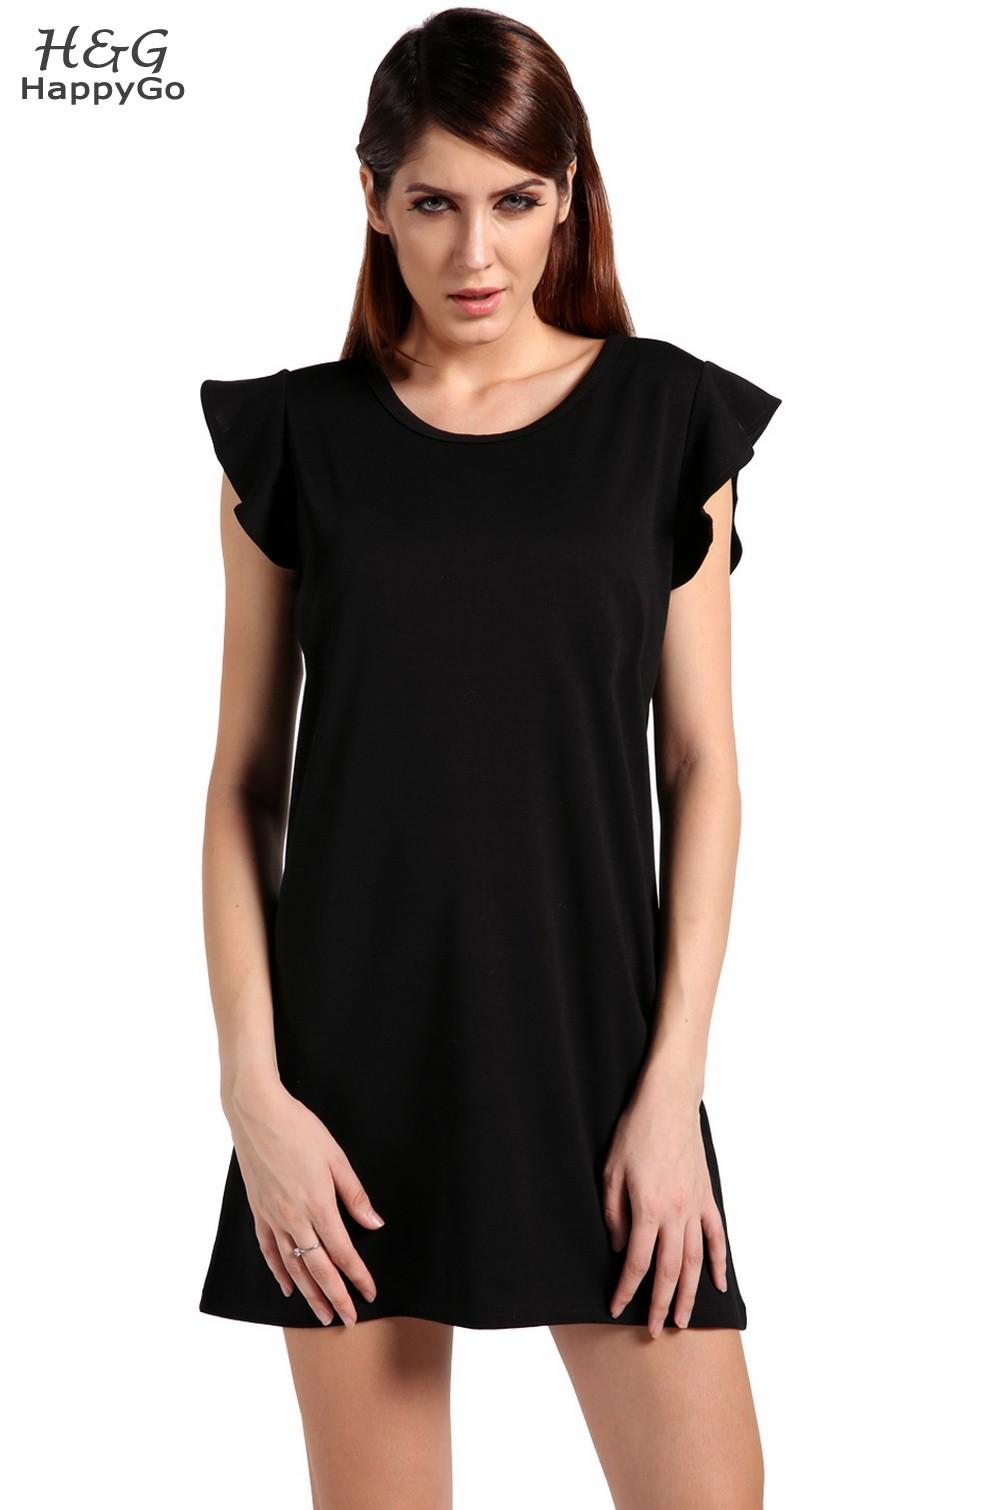 New Dress Plus Size Xxxl Women Clothing Autumn Winter Slim